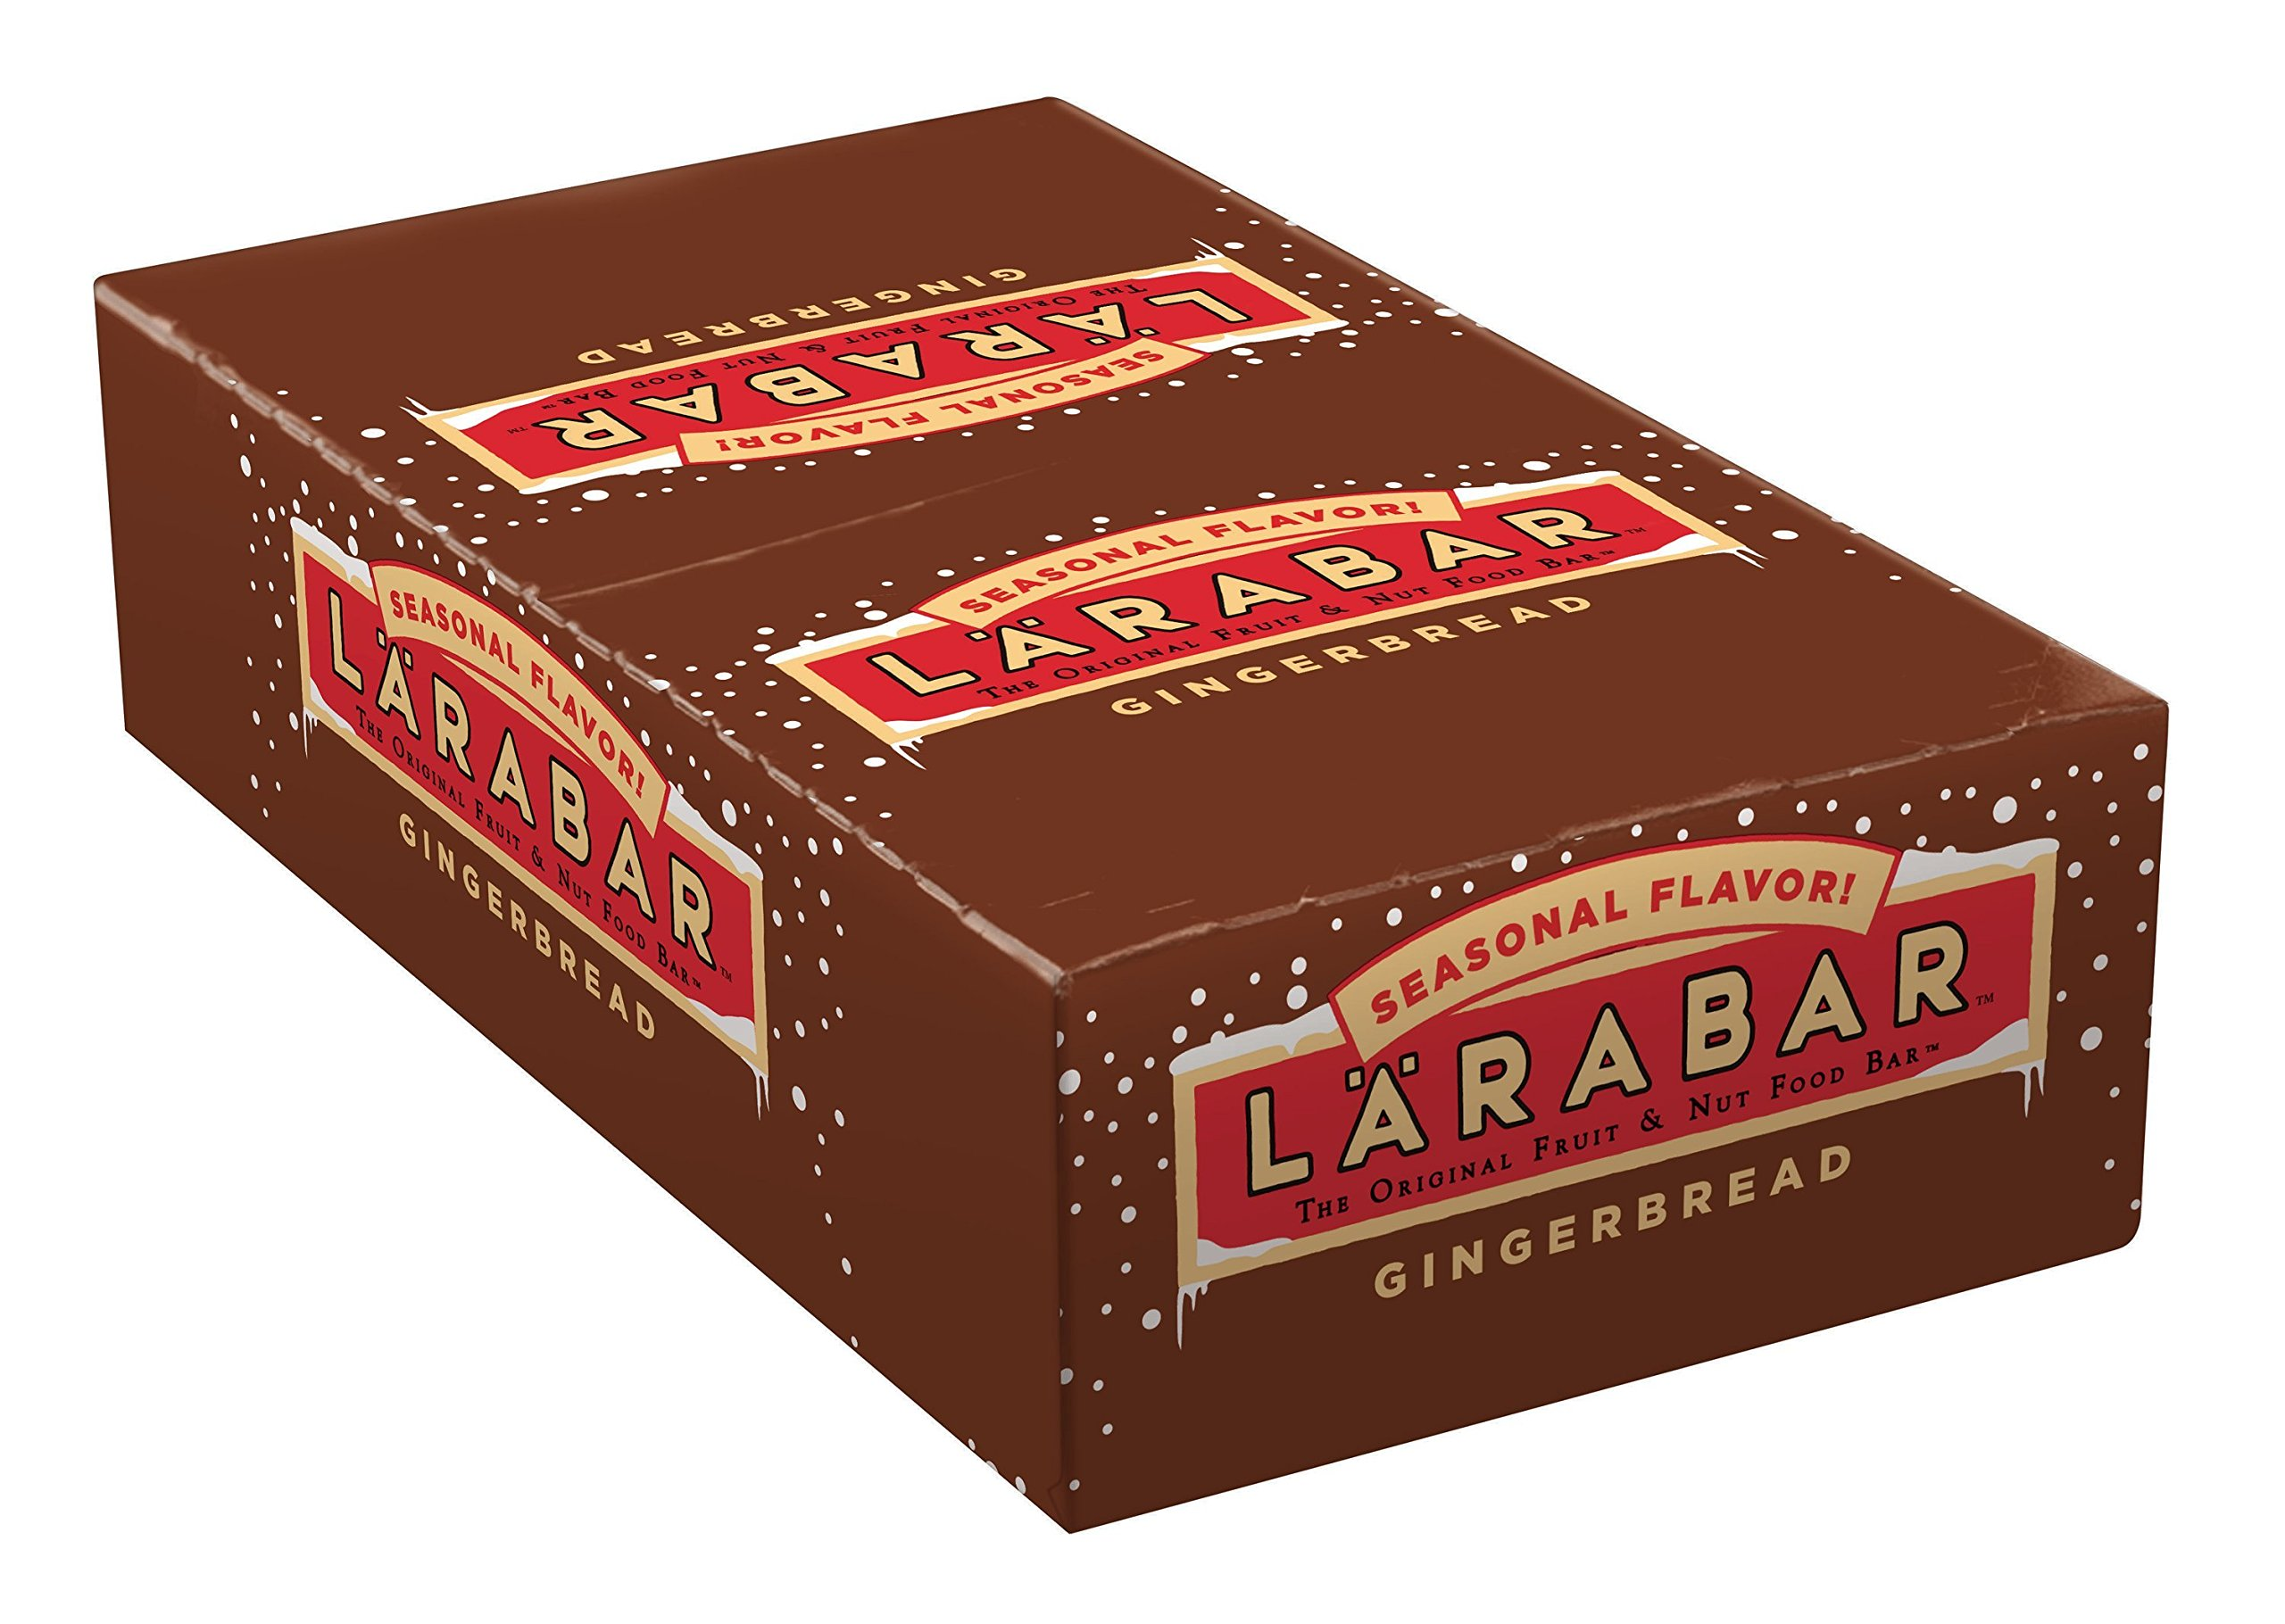 Larabar The Original Fruit and Nut Food Bar Gingerbread, 25.6 Ounce by LÄRABAR